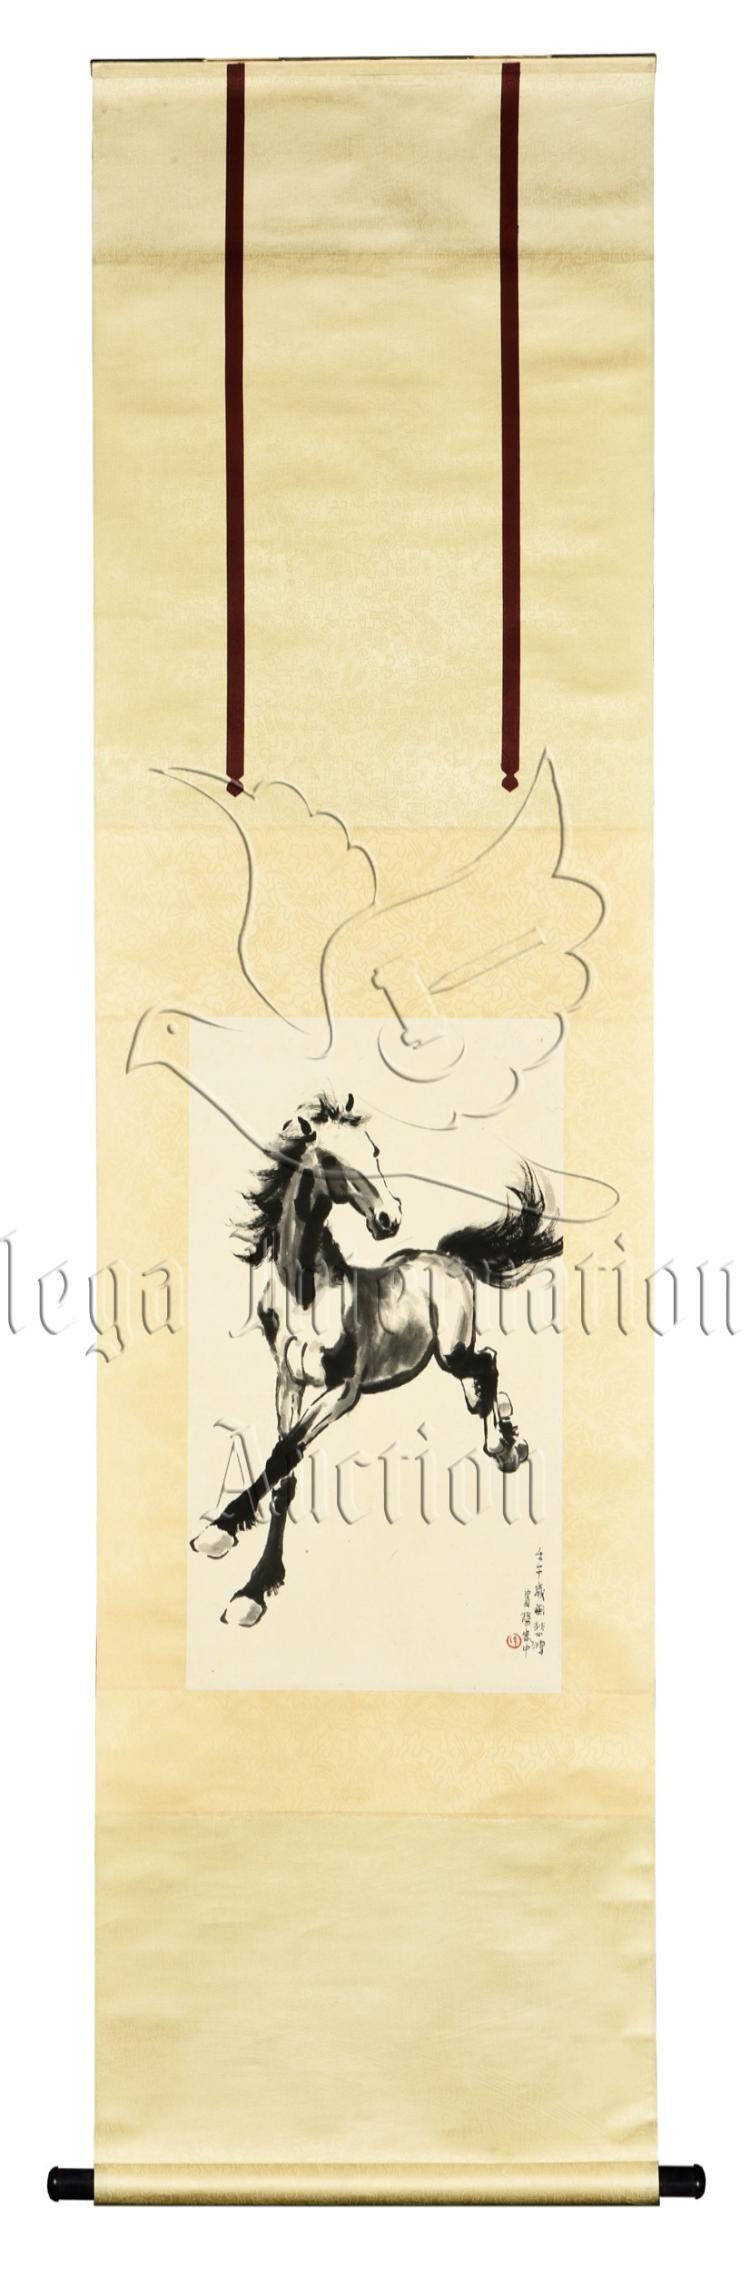 XU BEIHONG: INK ON PAPER PAINTING 'HORSE'